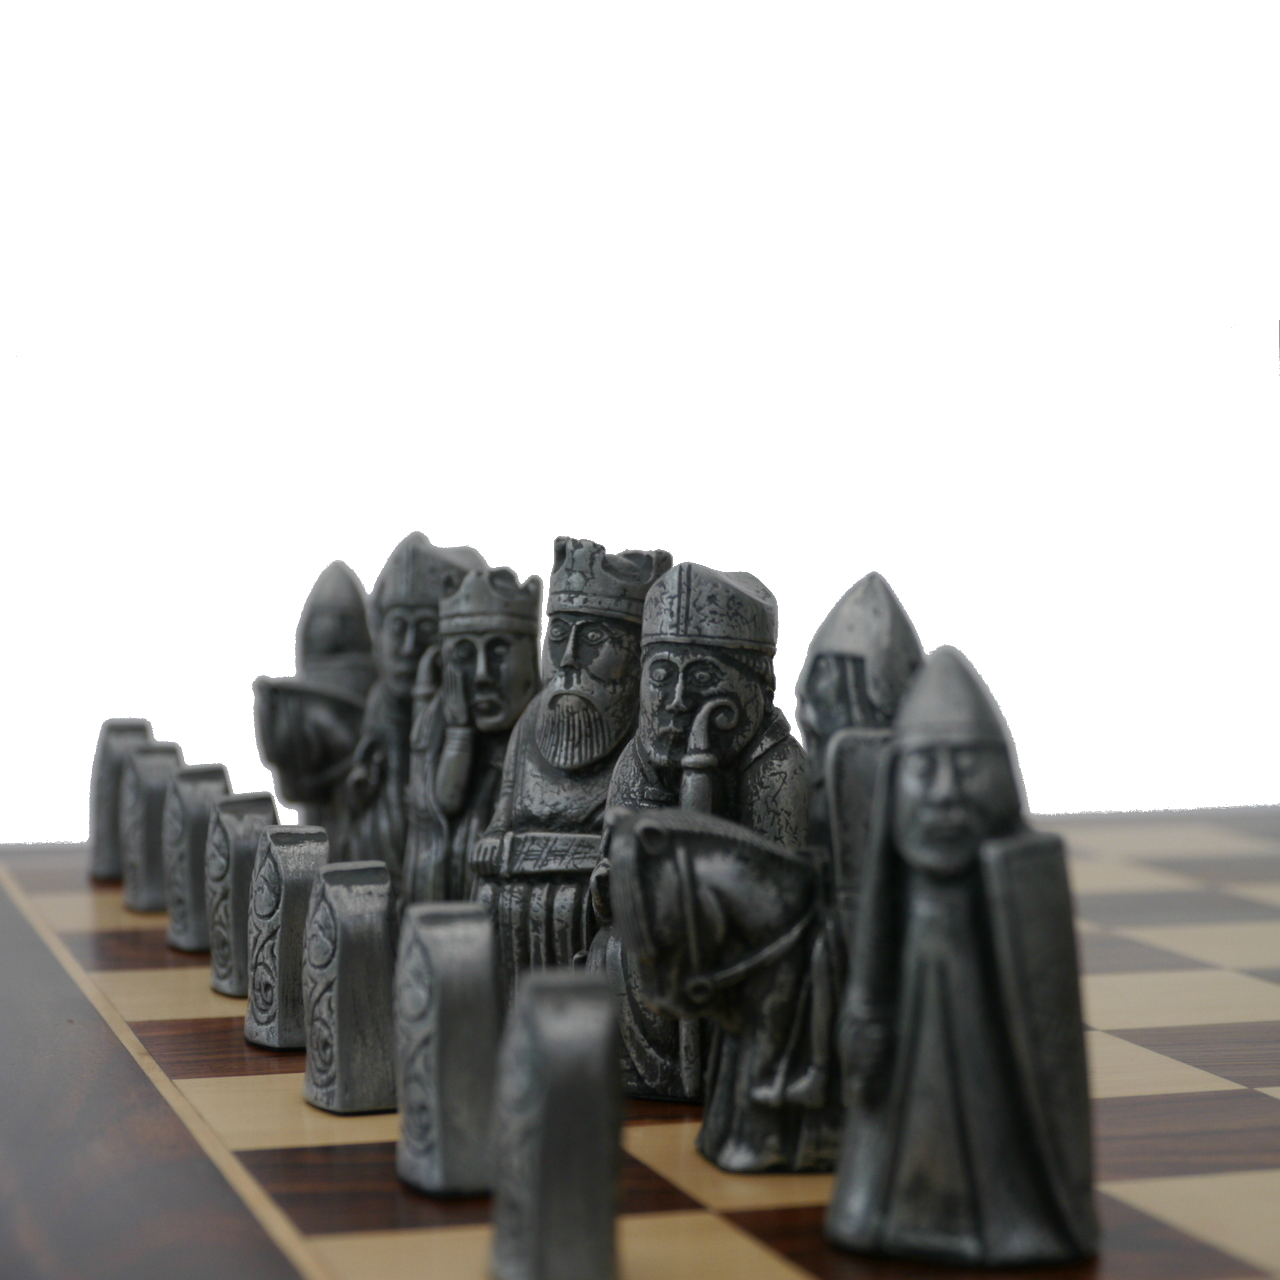 Berkeley Chess Isle of Lewis Metal Finish Chessmen pieces (BC4001)